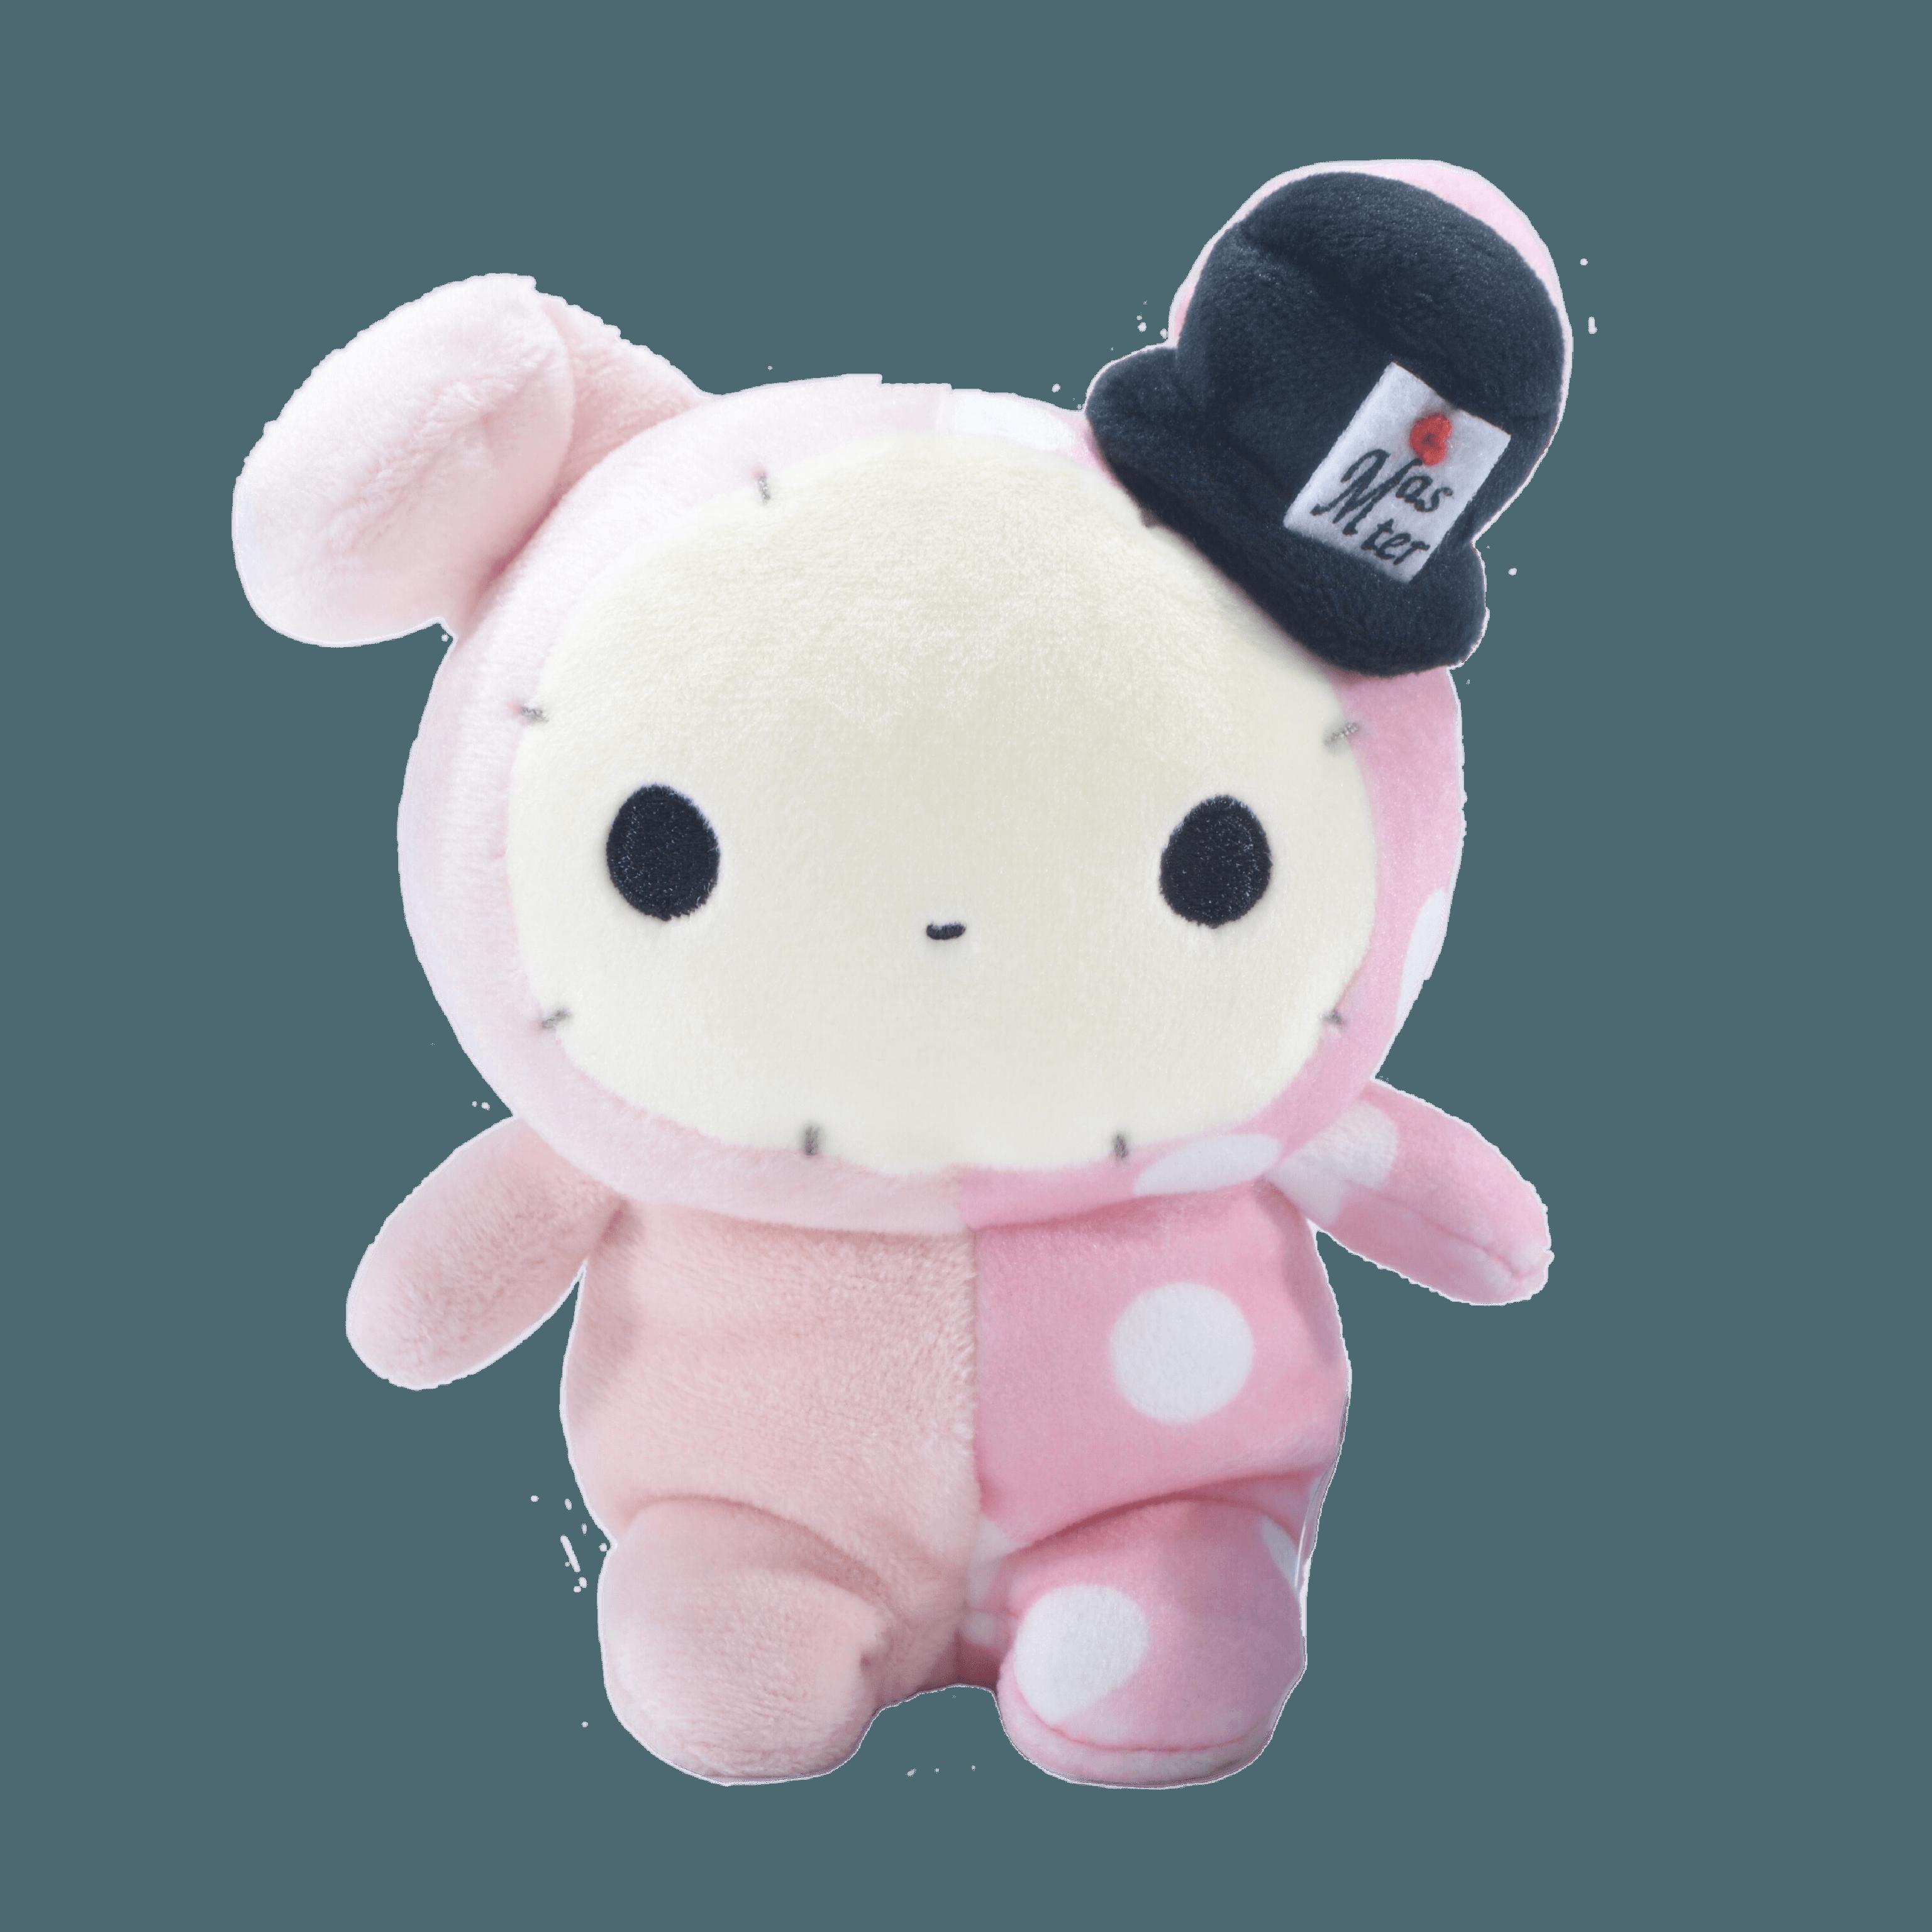 Sentimental Circus Shappo plush kawaii sanx san-x pastel pink aesthetic ringmaster ring master bunny rabbit kawaii plushie plushies import imported japan japanese authentic rare cute